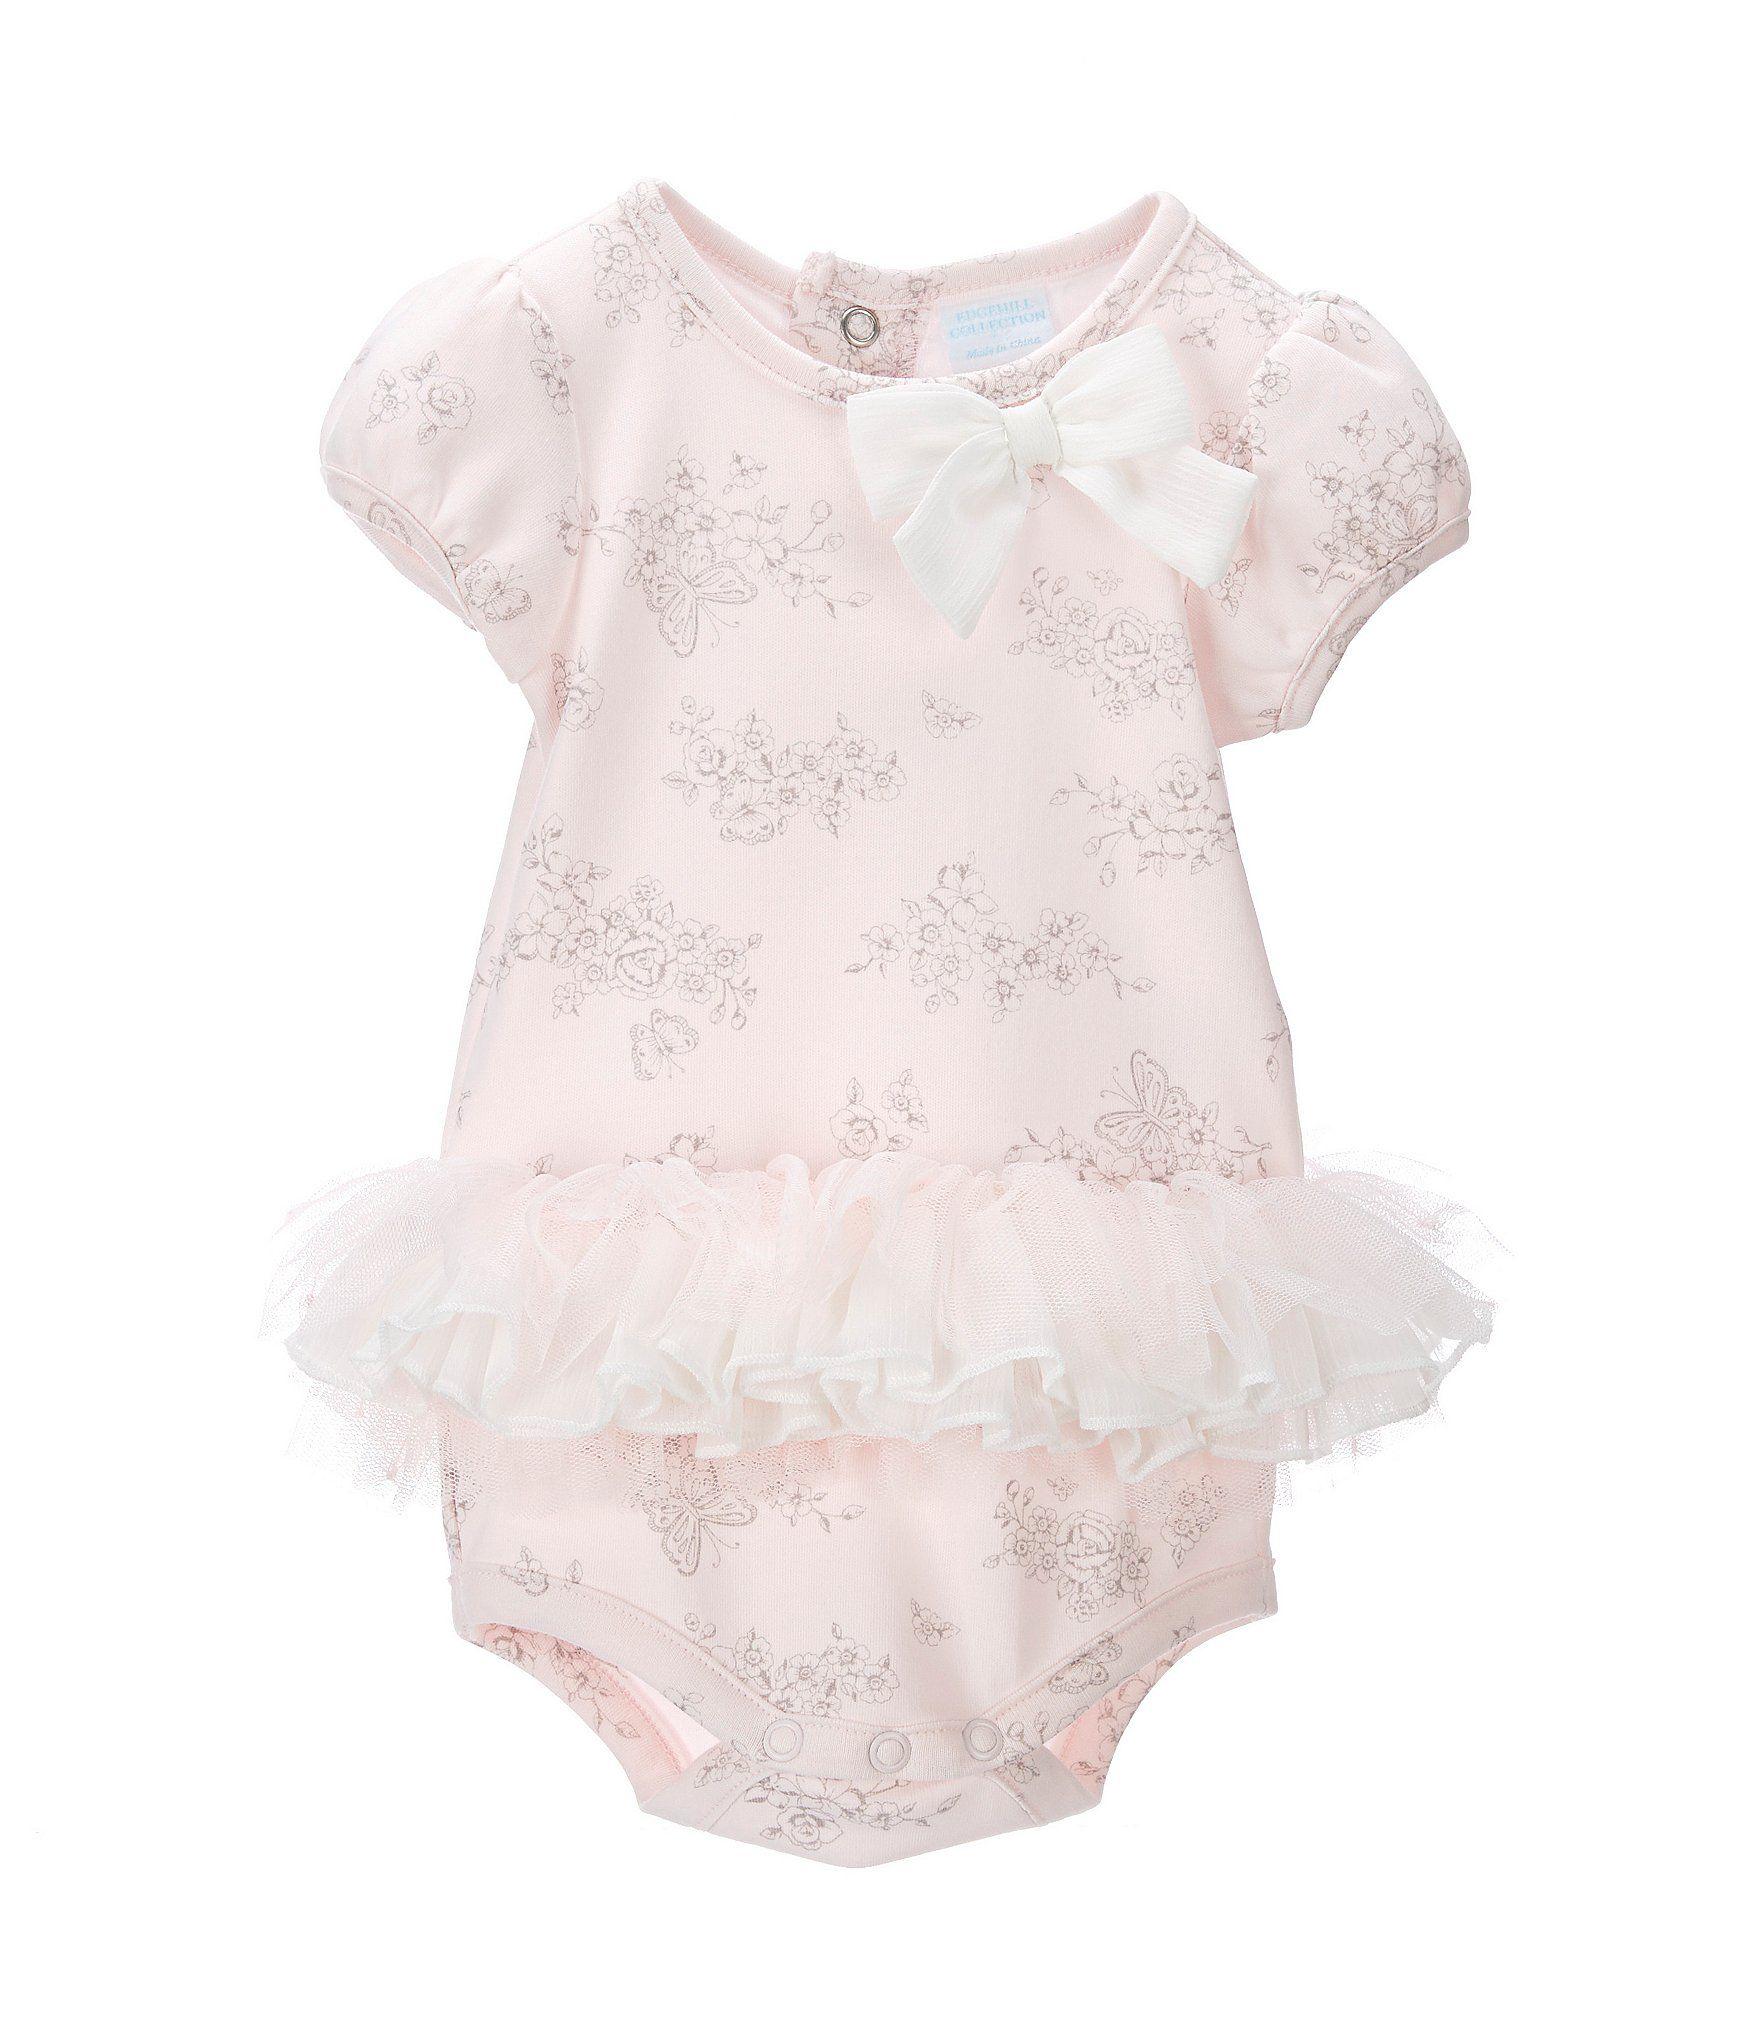 088e86c58776 Edgehill Collection Baby Girls Newborn6 Months Printed Tutu Bodysuit ...